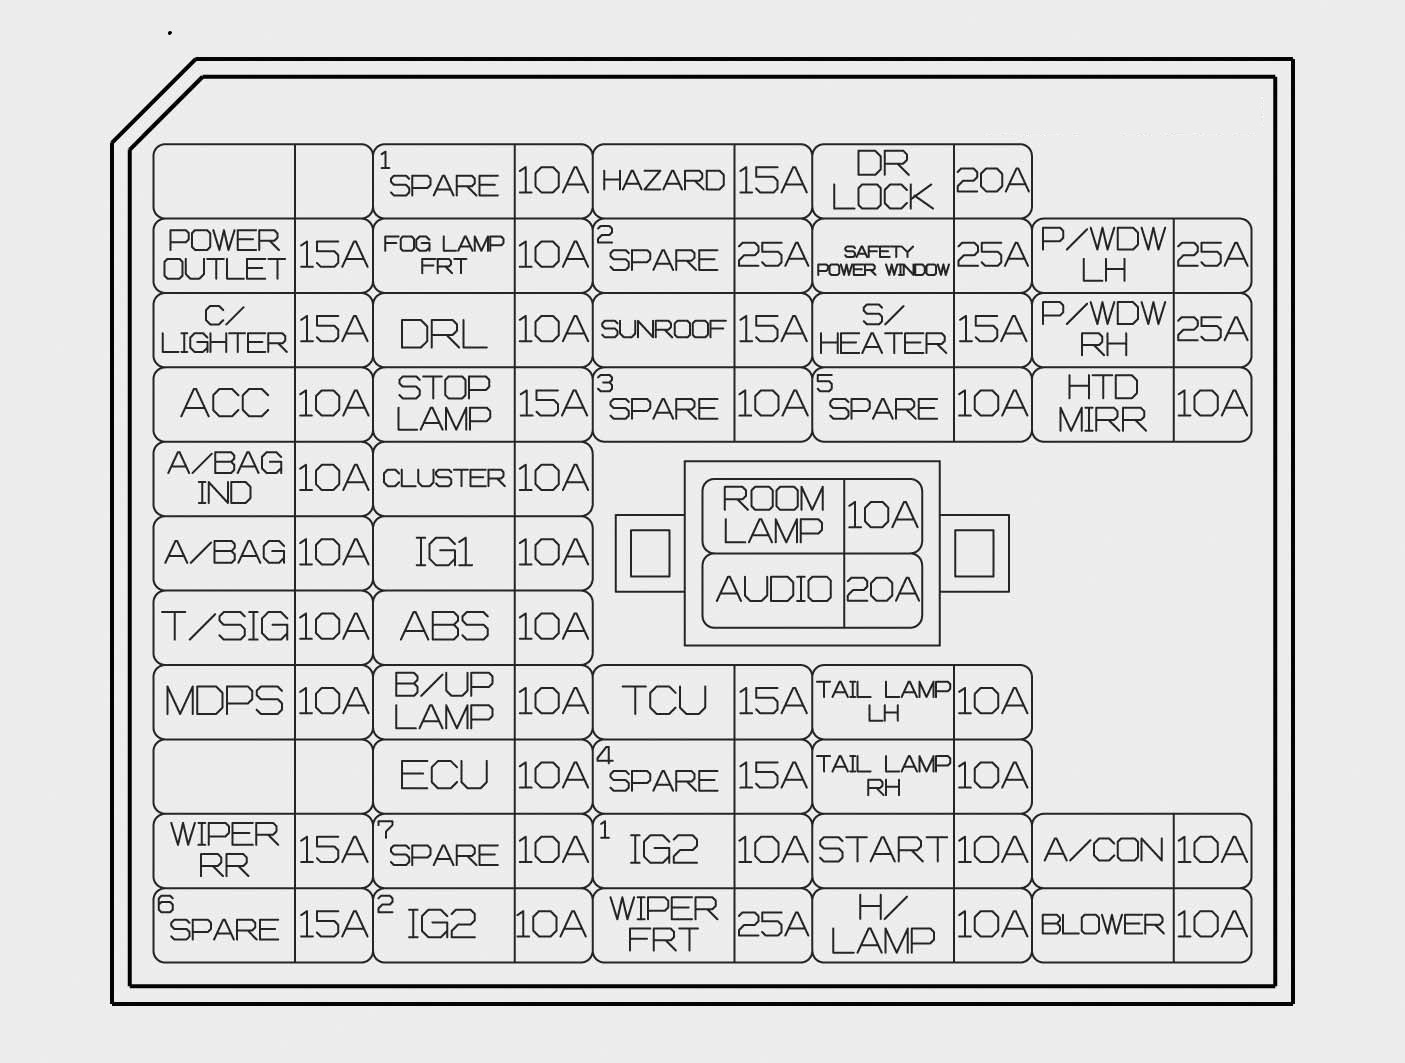 2016 hyundai sonata wiring diagram pioneer avic n2 2015  fuse box auto genius